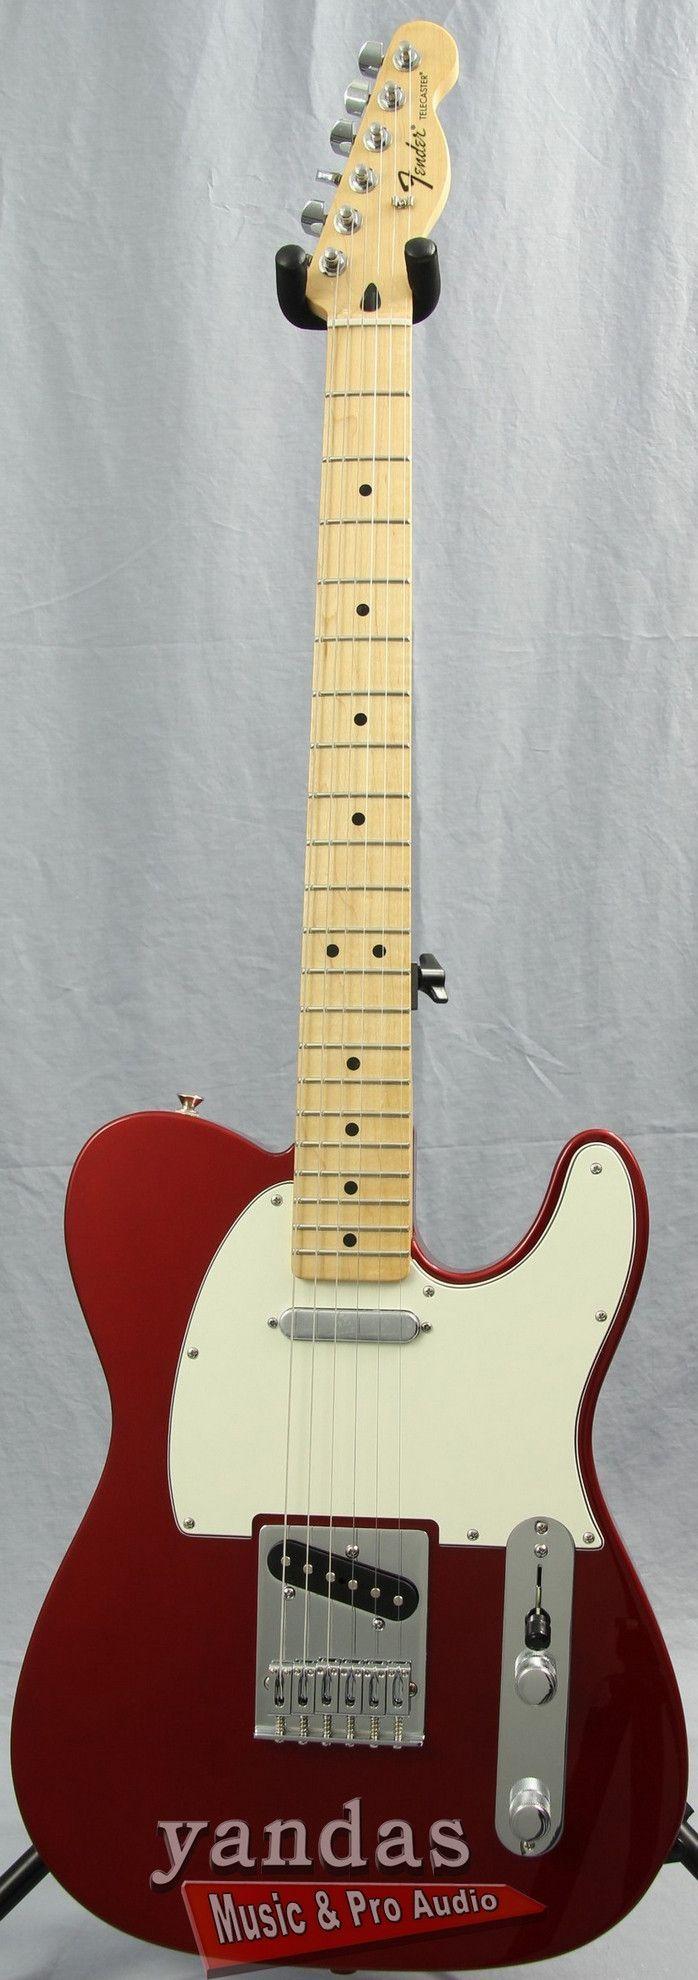 Fender Standard Telecaster Electric Guitar www.guitaristica.org #electricguitar #guitars #guitaristica